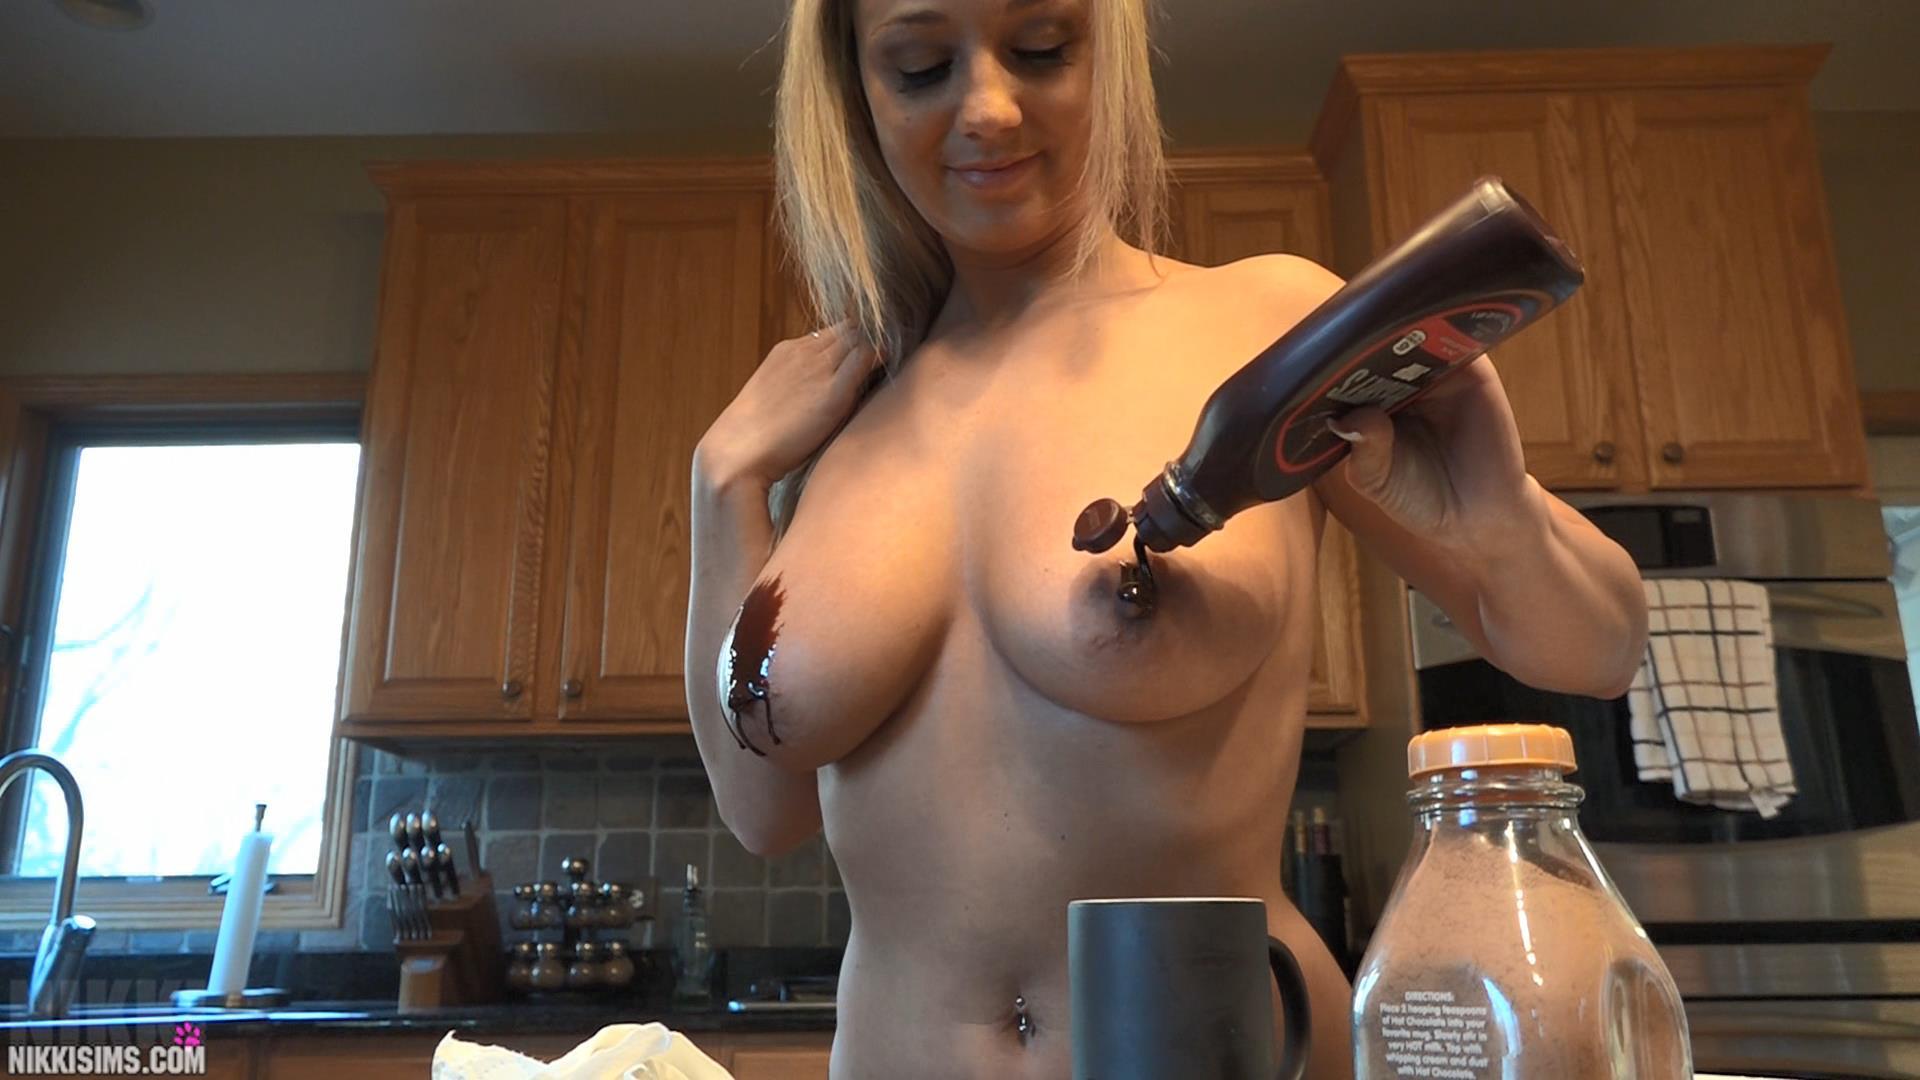 Nikki sims big tits videos, extremely large clitoris